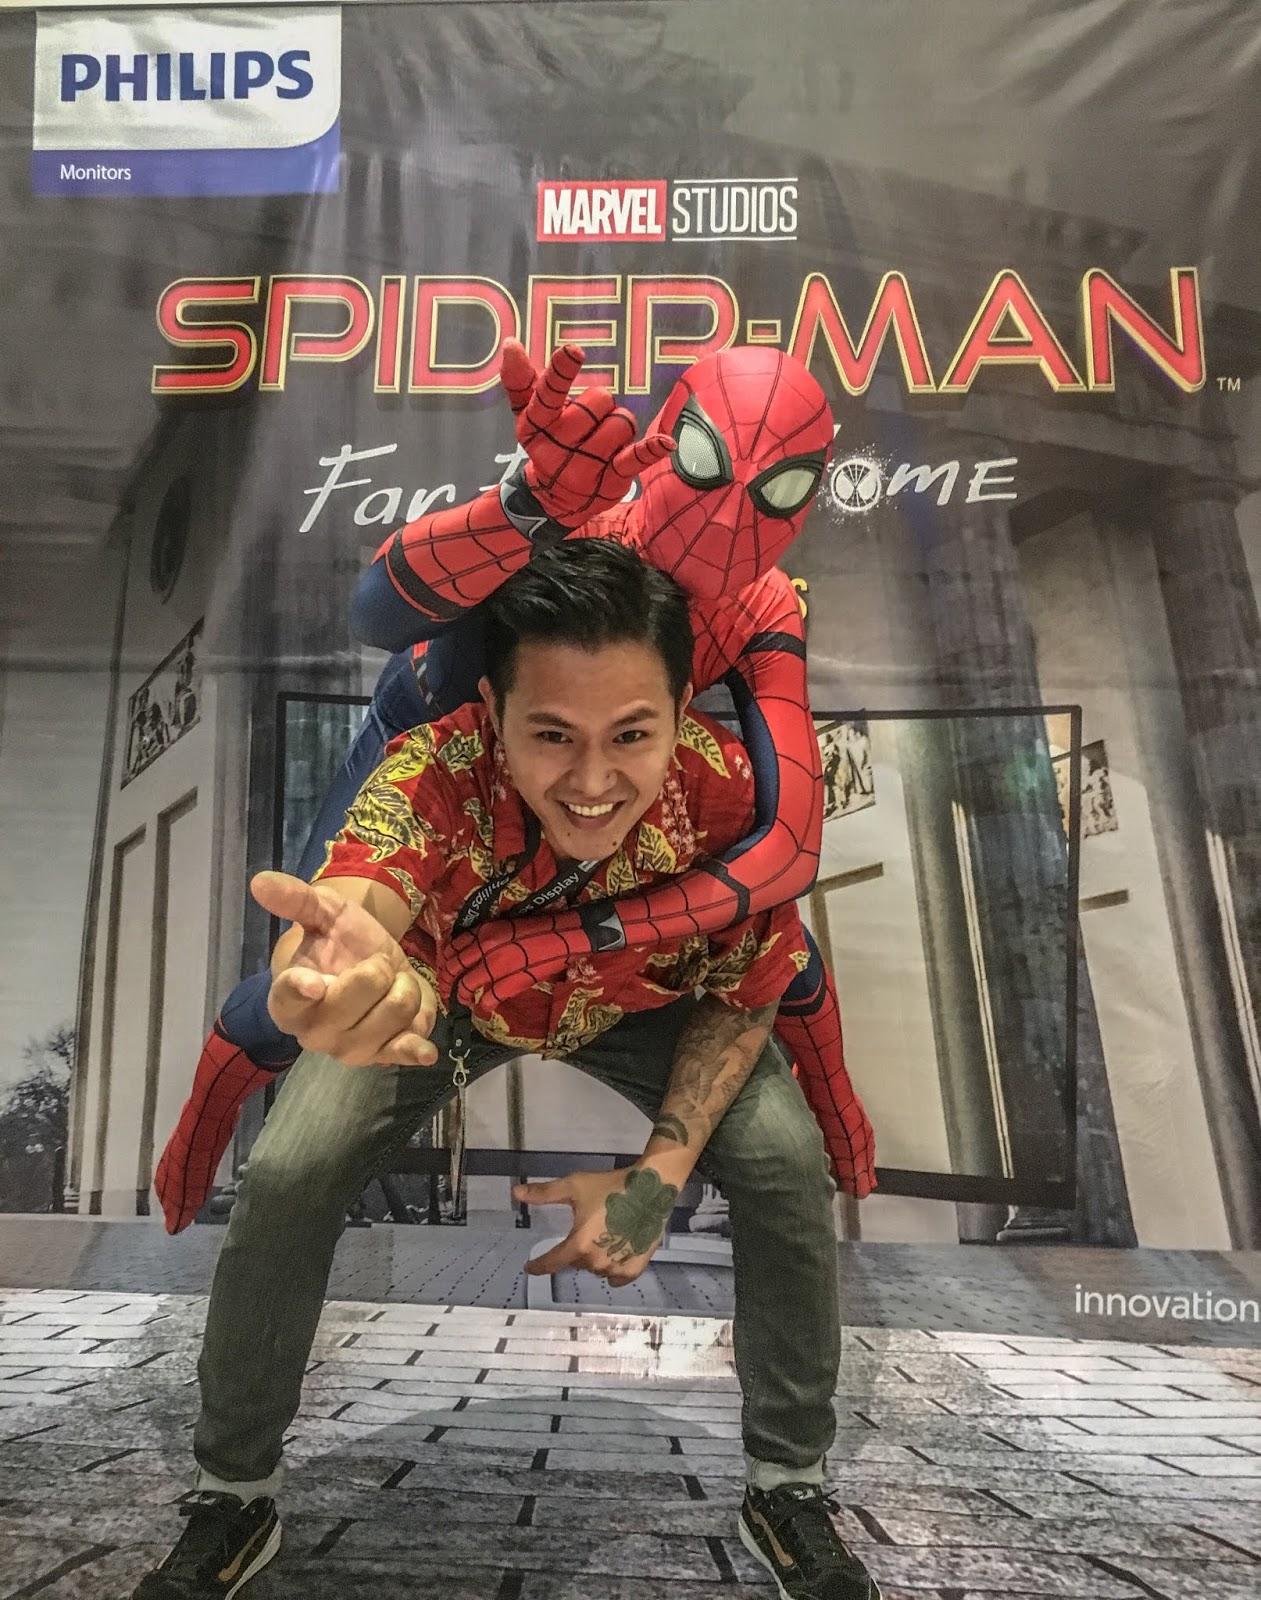 Spiderman Philips Monitor Cebu Blogger LydelD